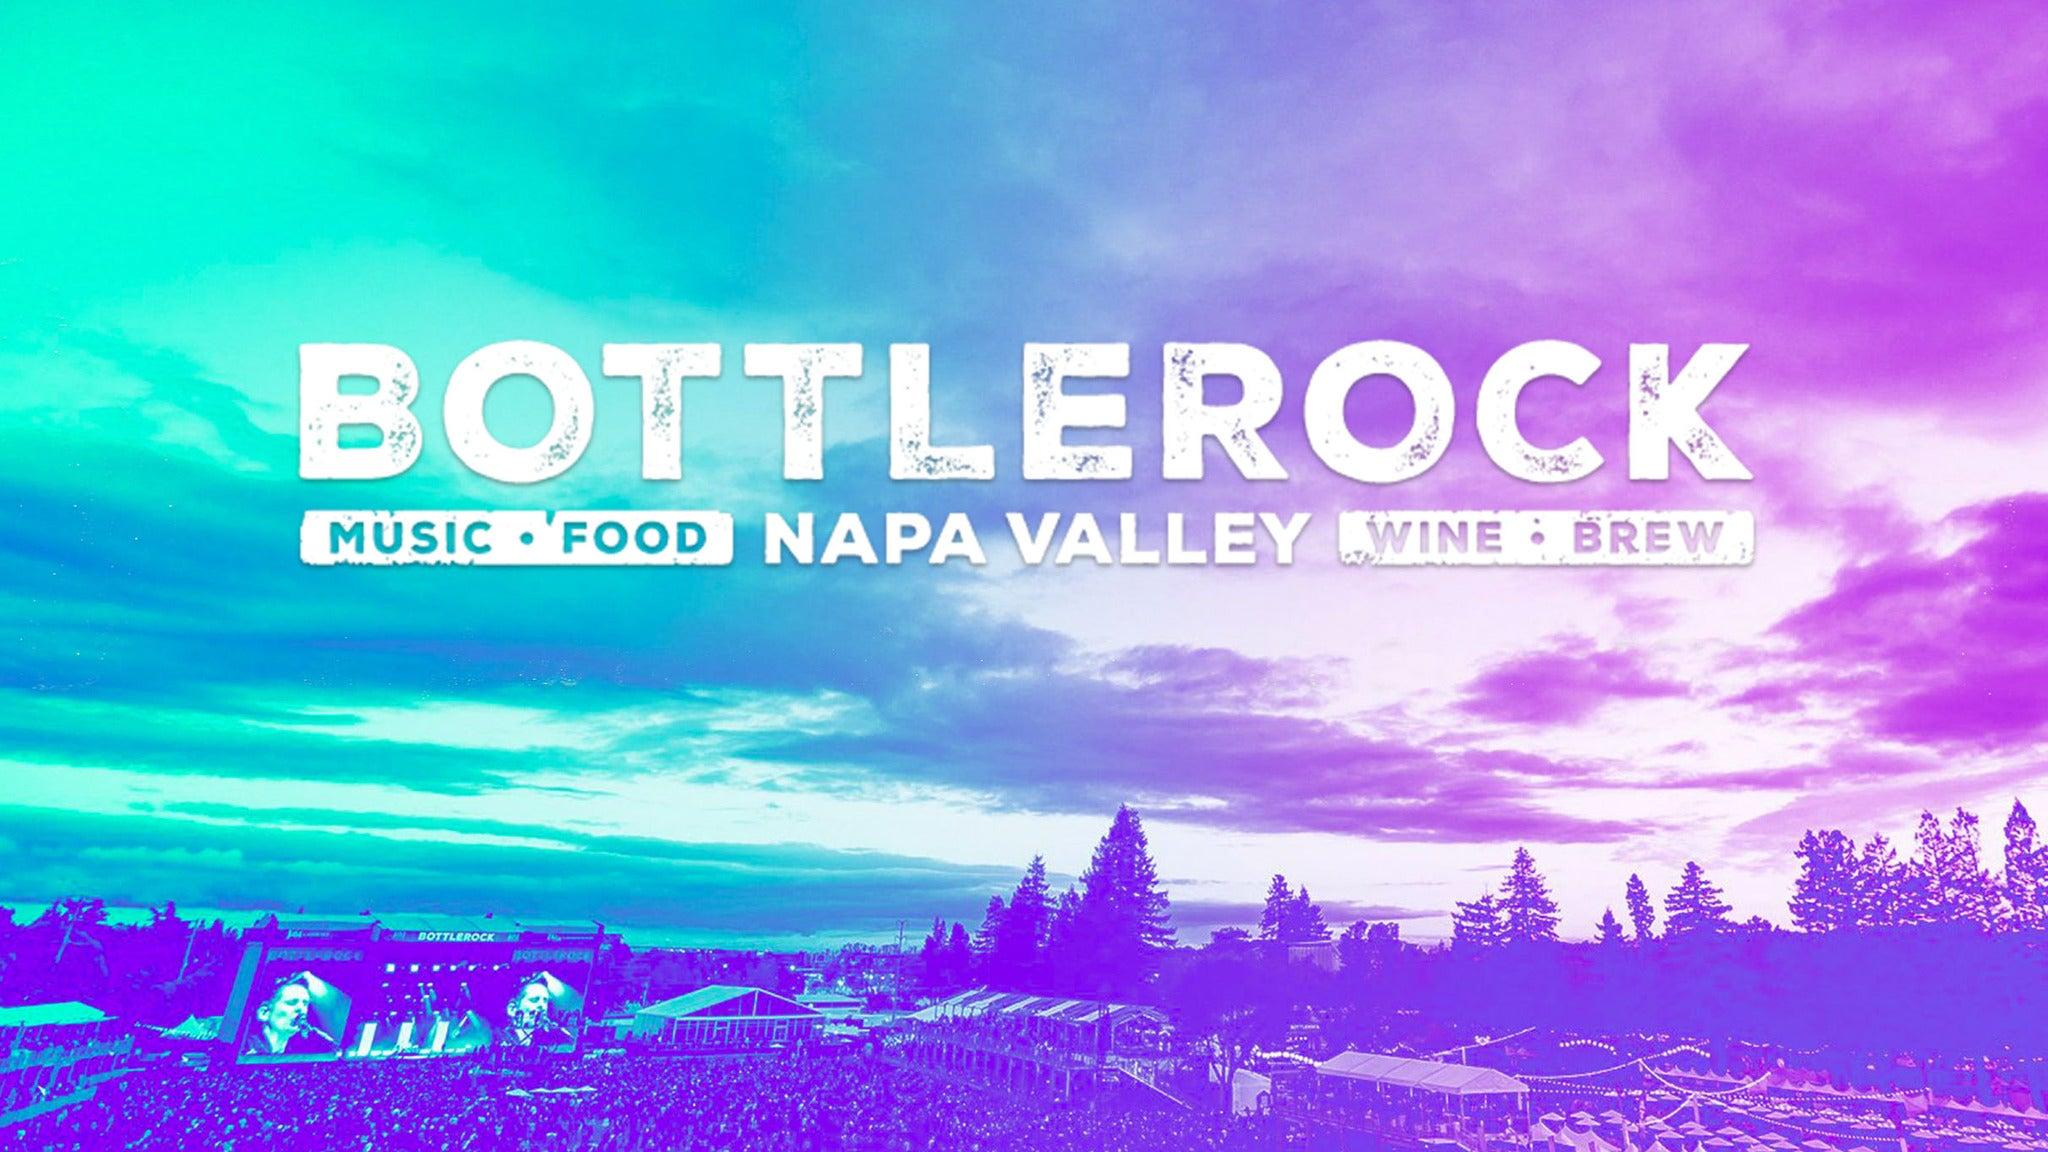 BottleRock Napa Valley at Napa Valley Expo